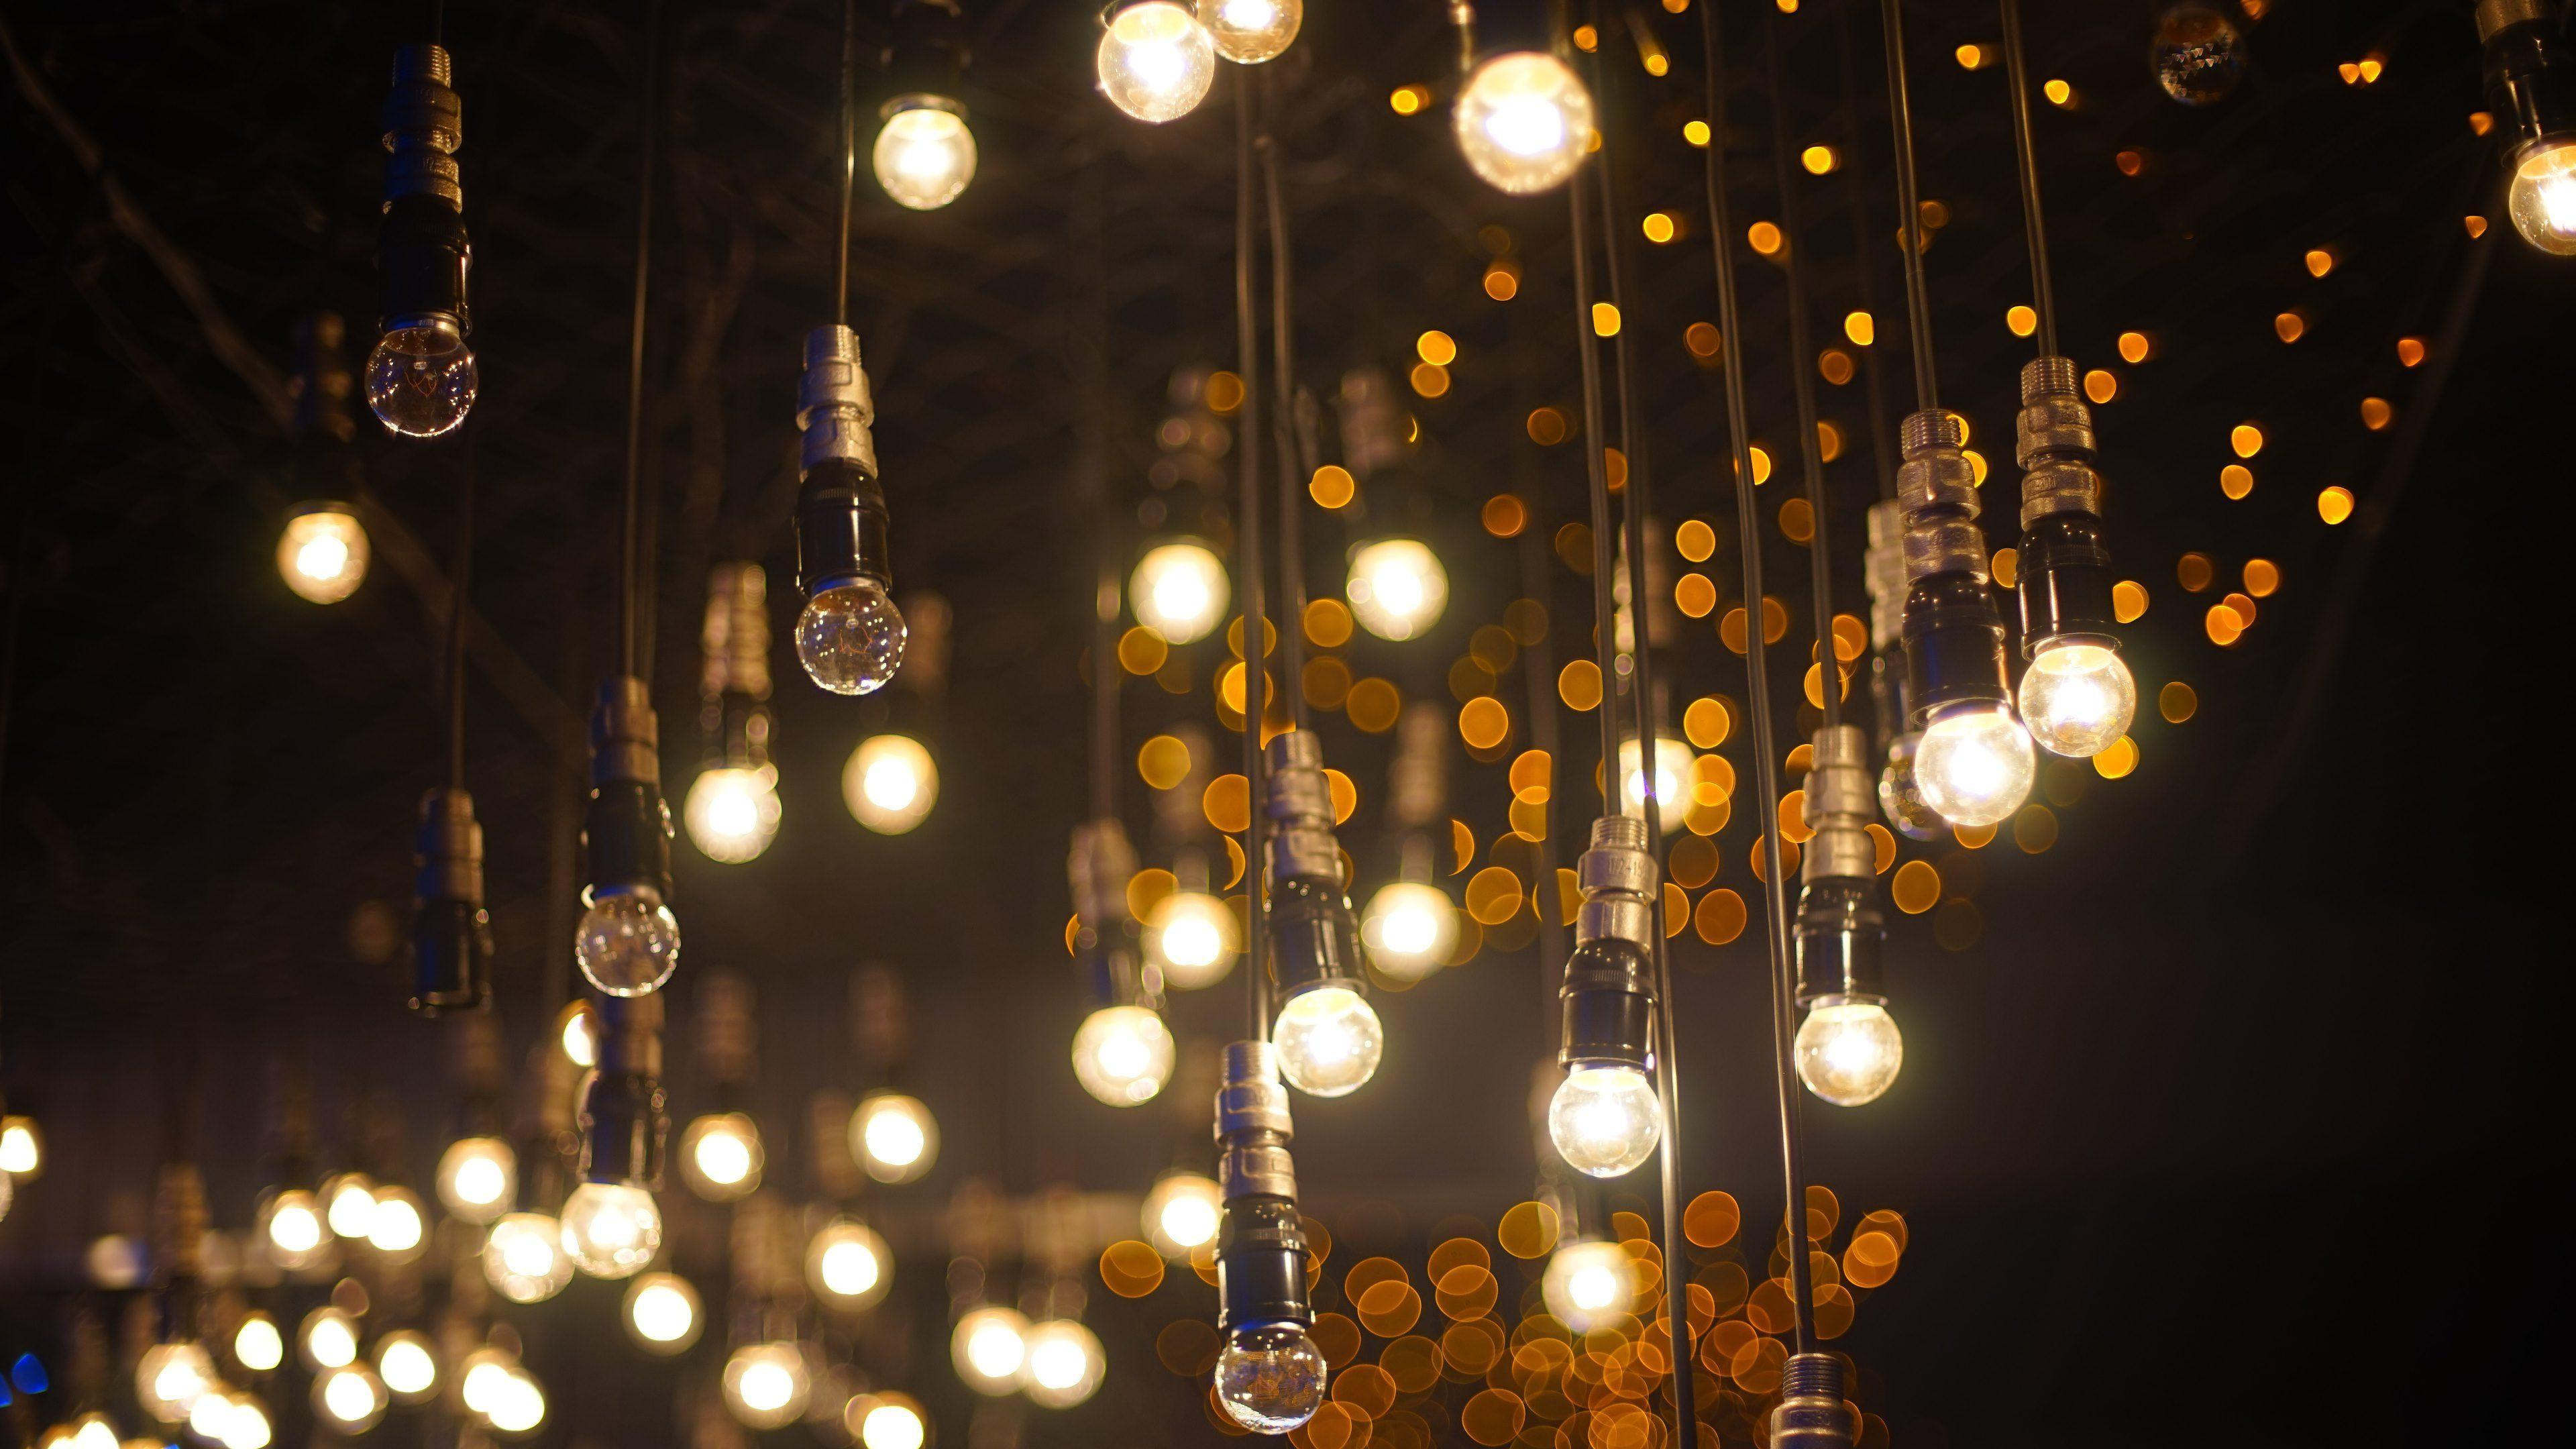 light bulb hd wallpapers - wallpaper cave